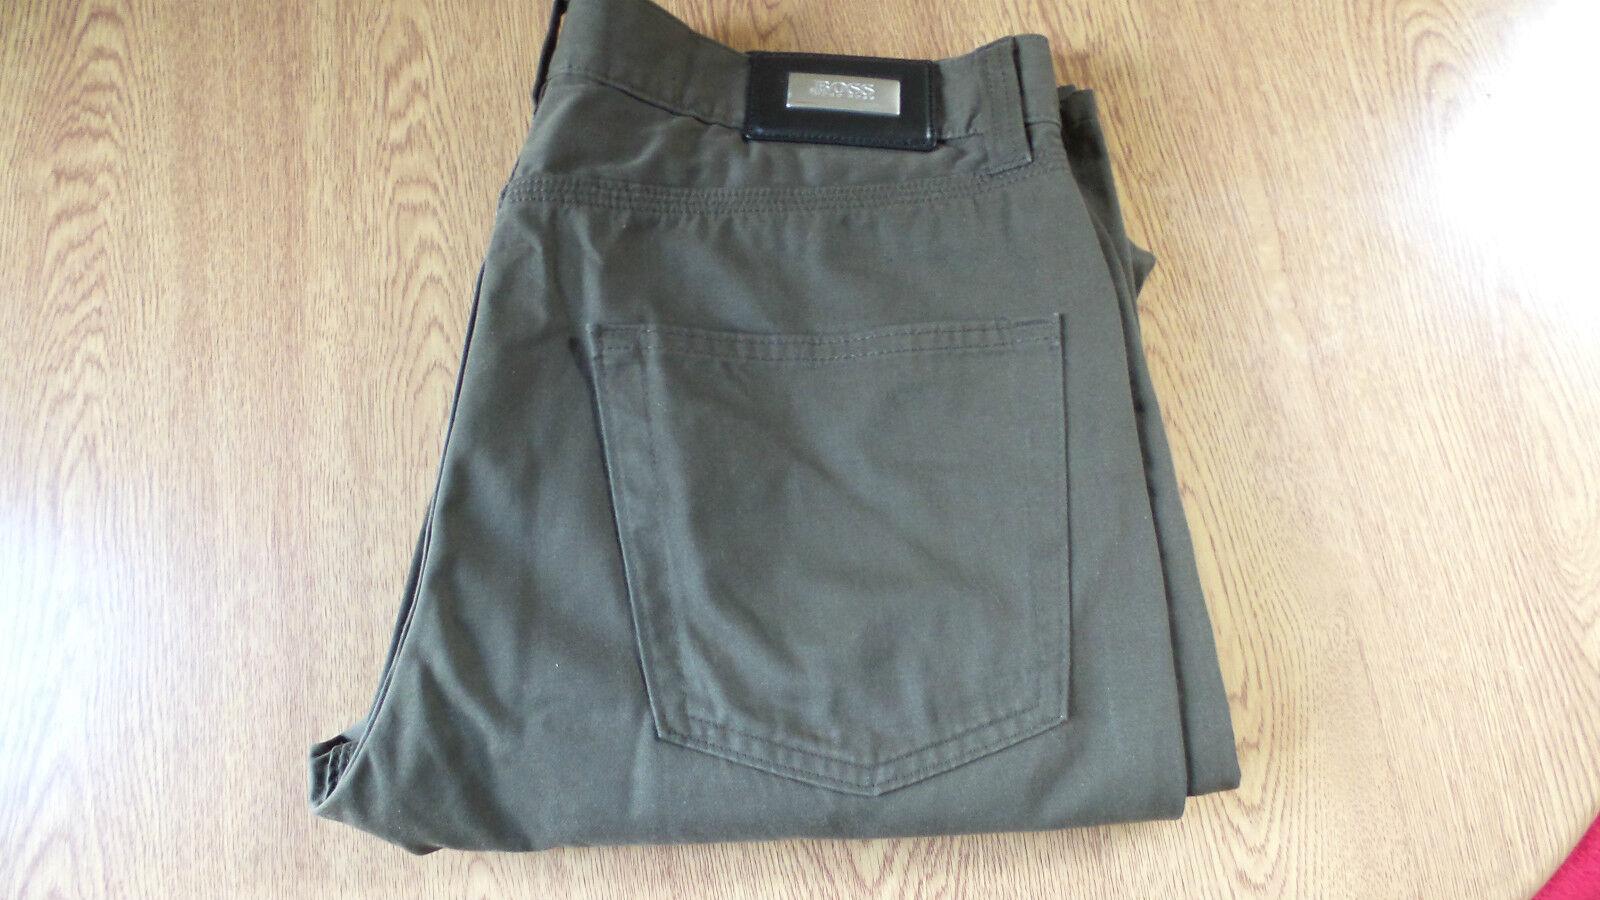 HUGO BOSS select line alabama jeans style trousers 33X34